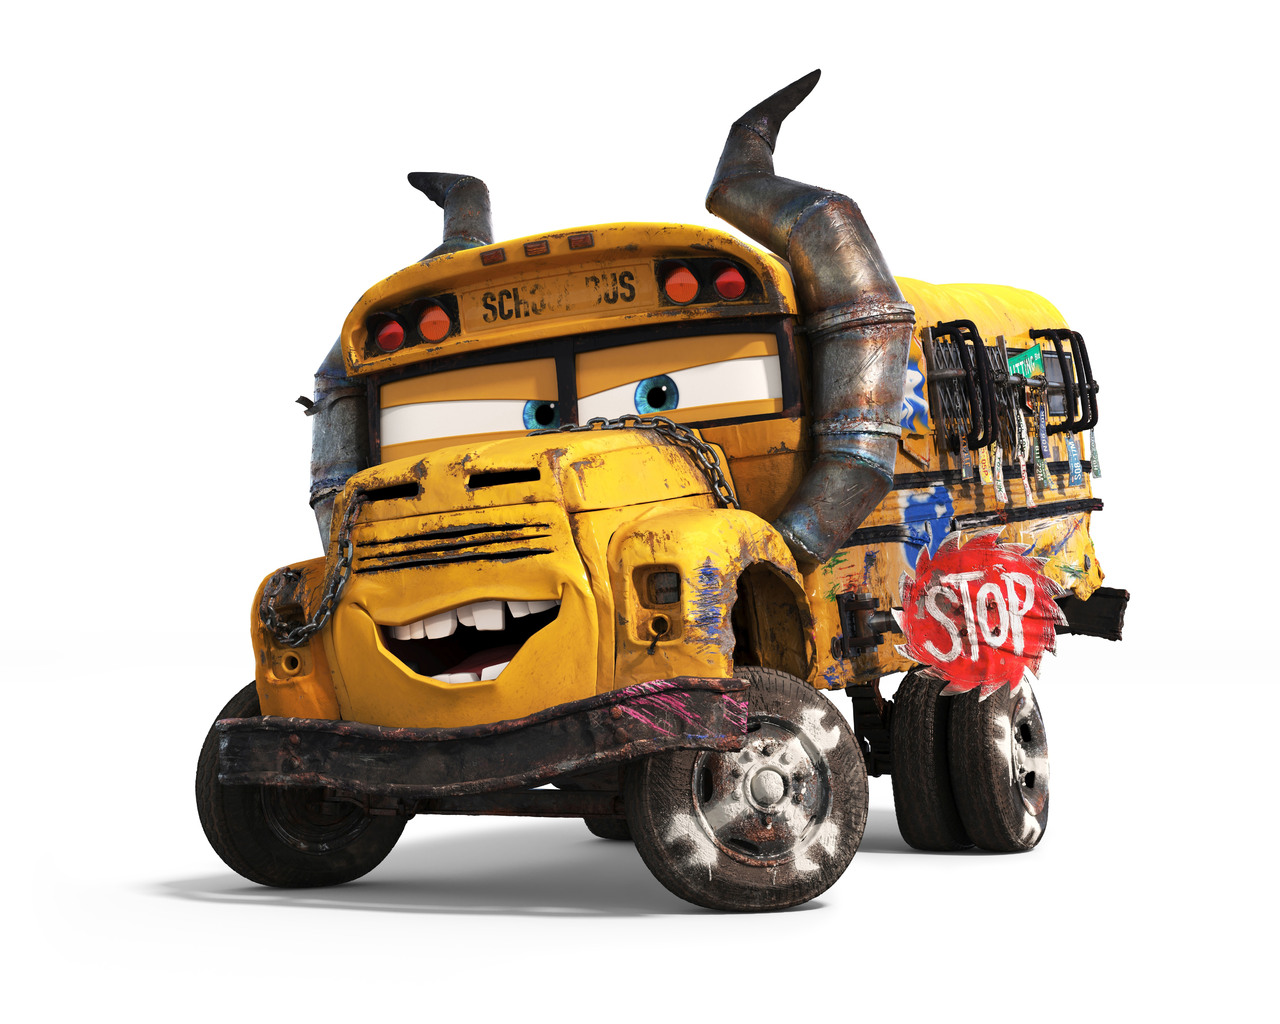 cars-3-truck-8t.jpg